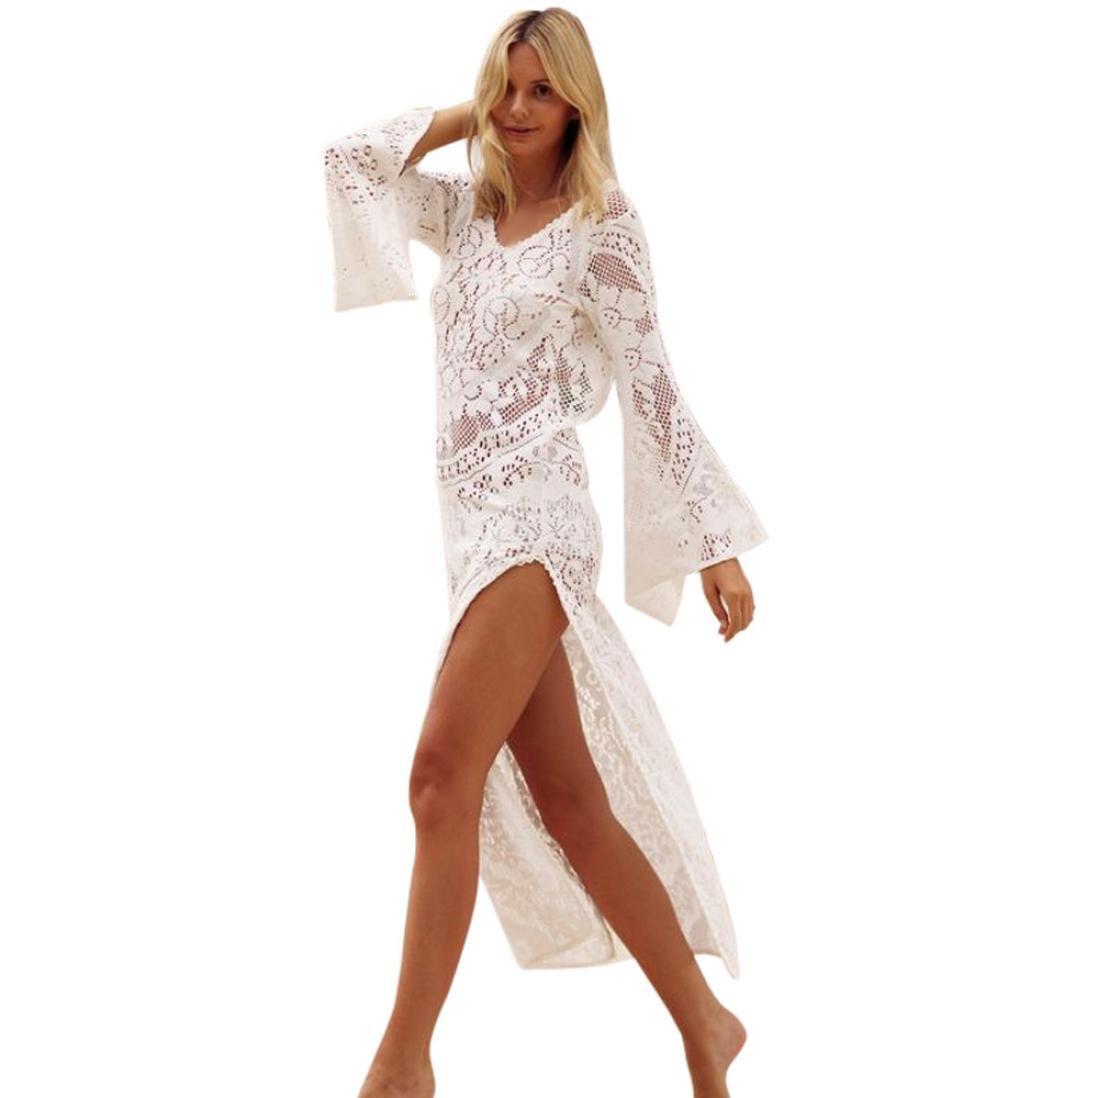 deb4710ae1e Top 10 wholesale Classy Short White Dresses - Chinabrands.com